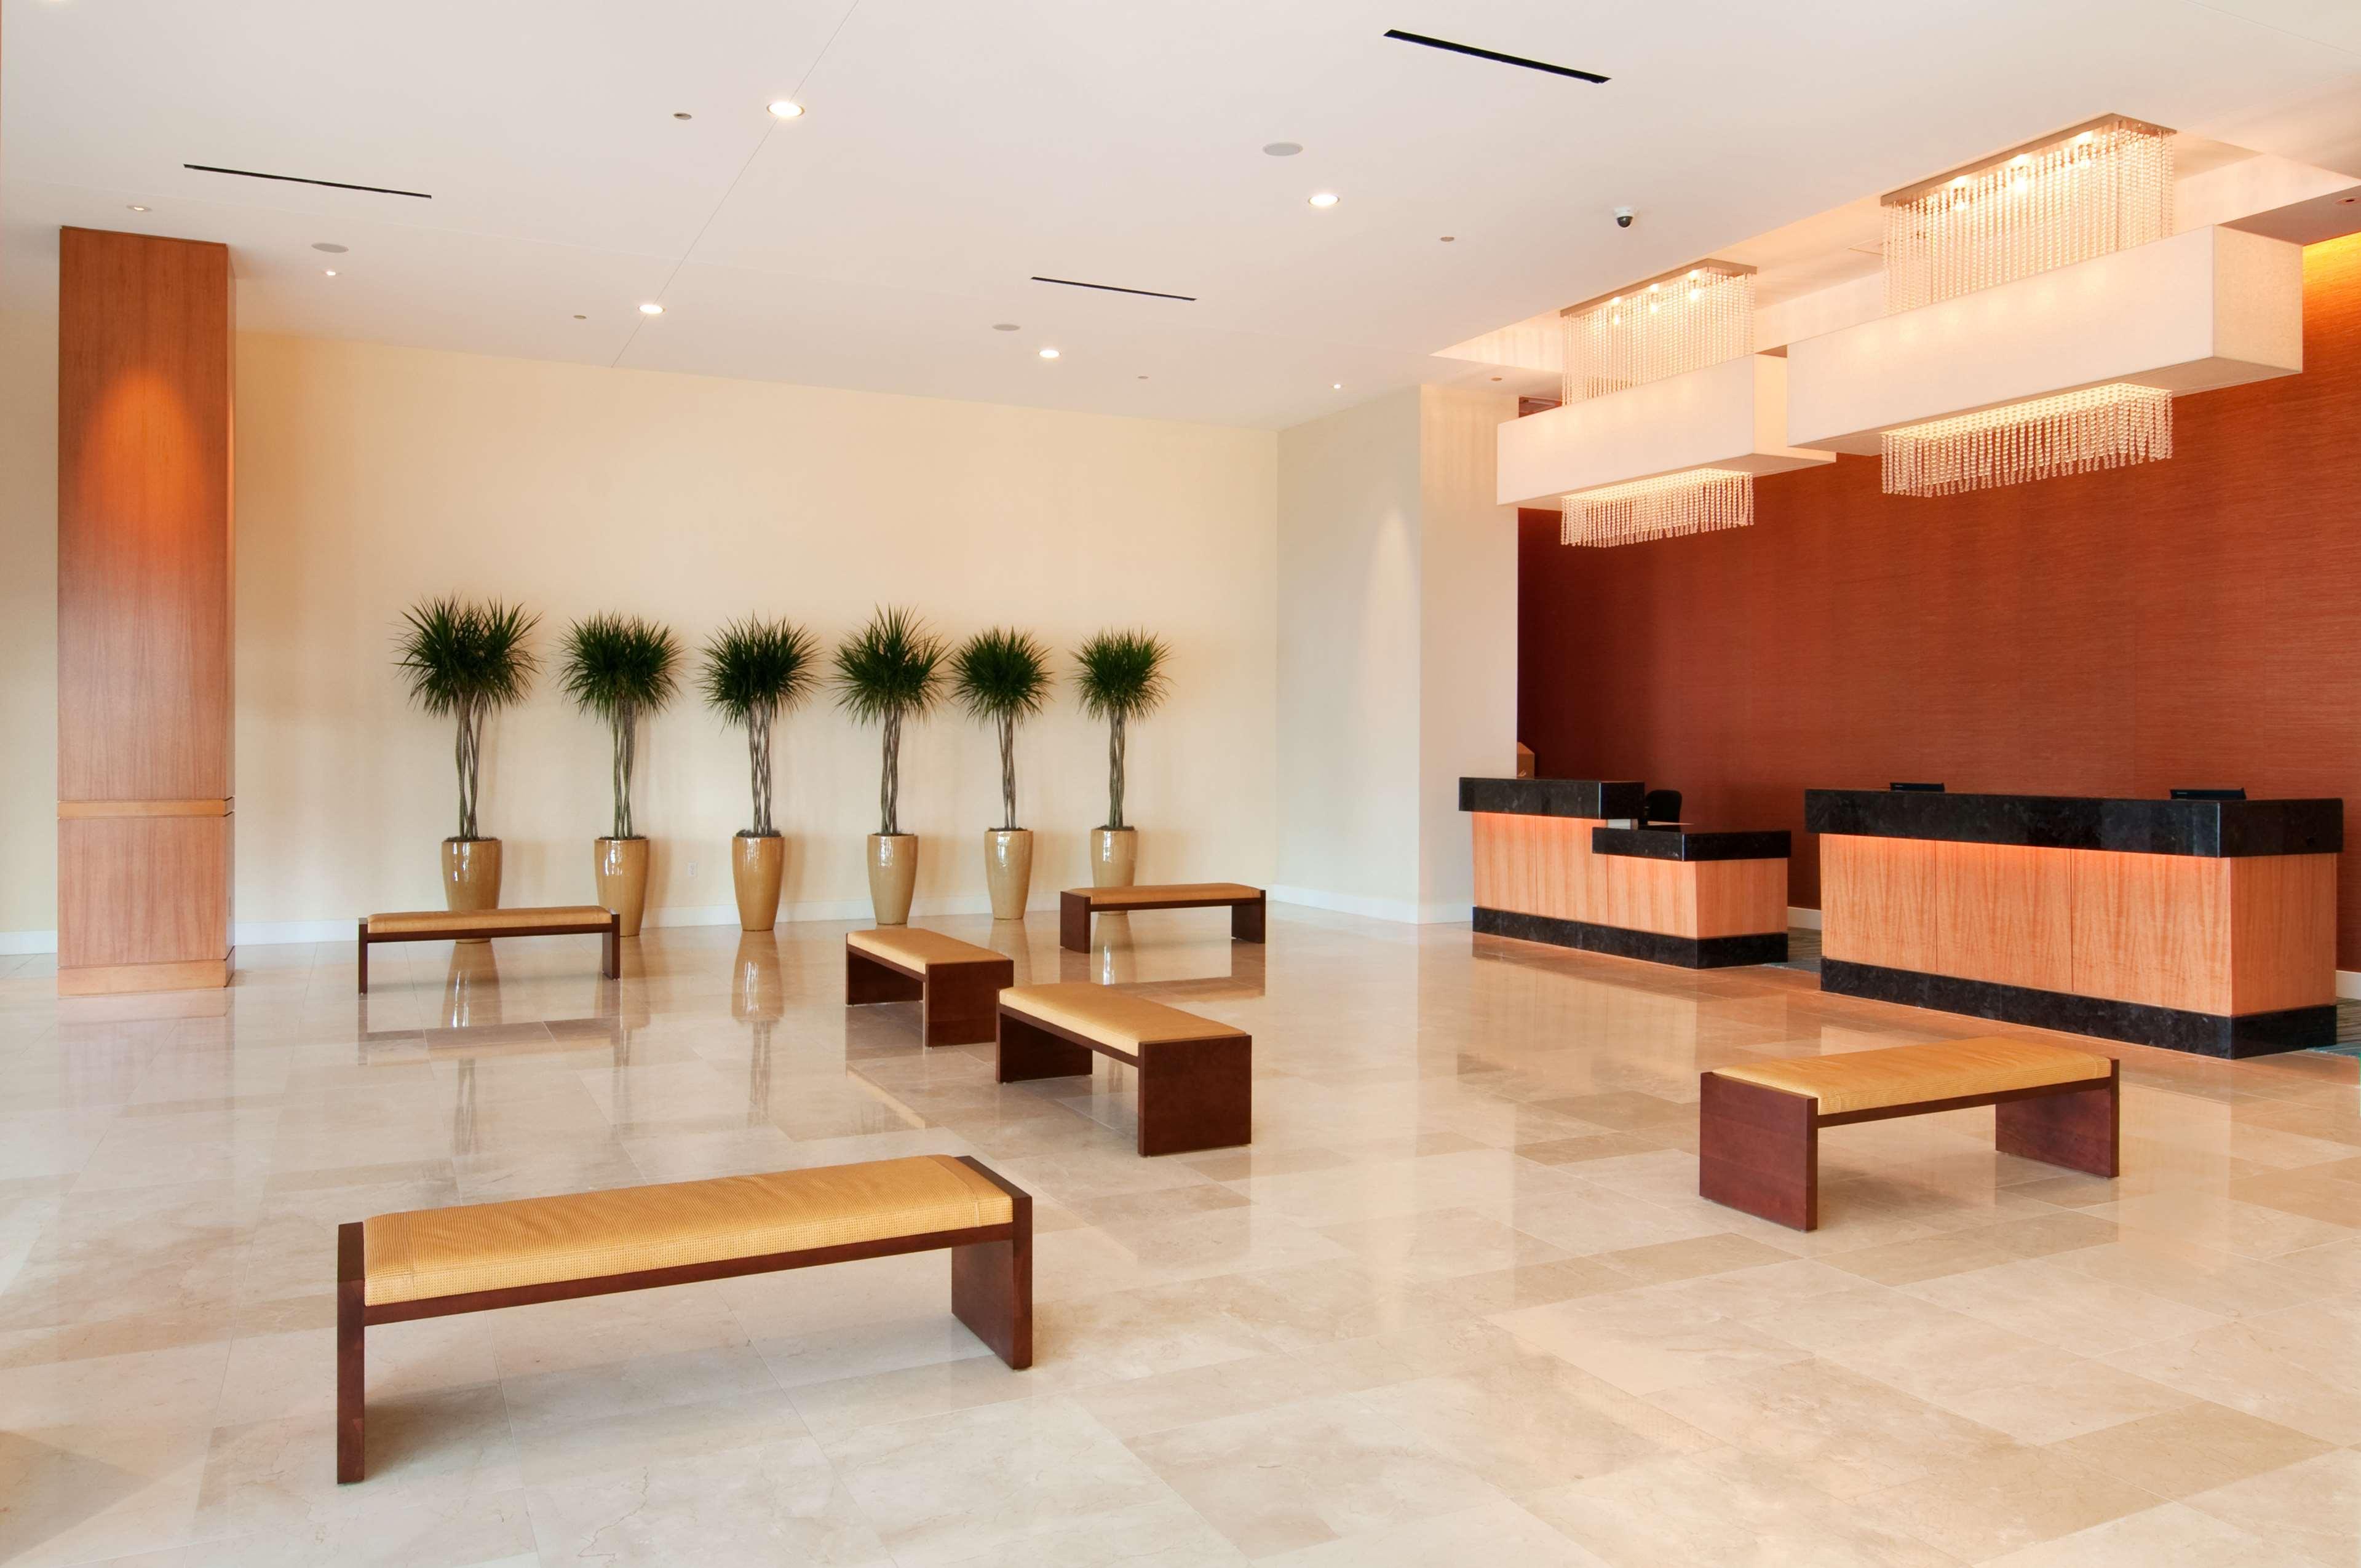 Hilton Orlando image 4